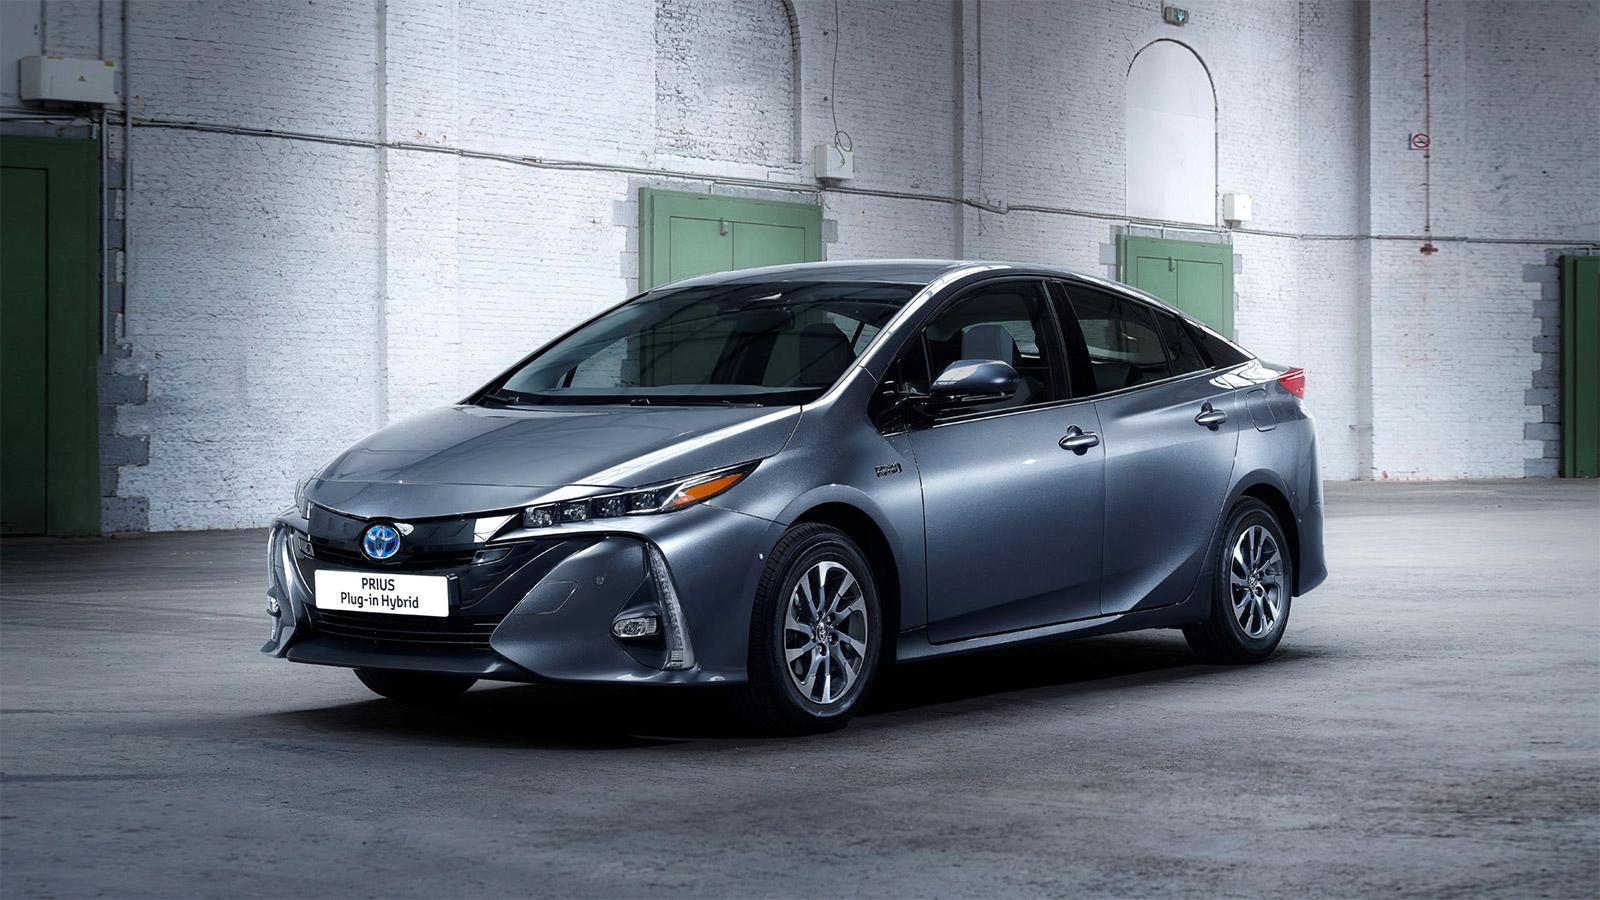 Laadpaal plaatsen voor een Toyota Prius Plug-in Hybrid? - ENGIE